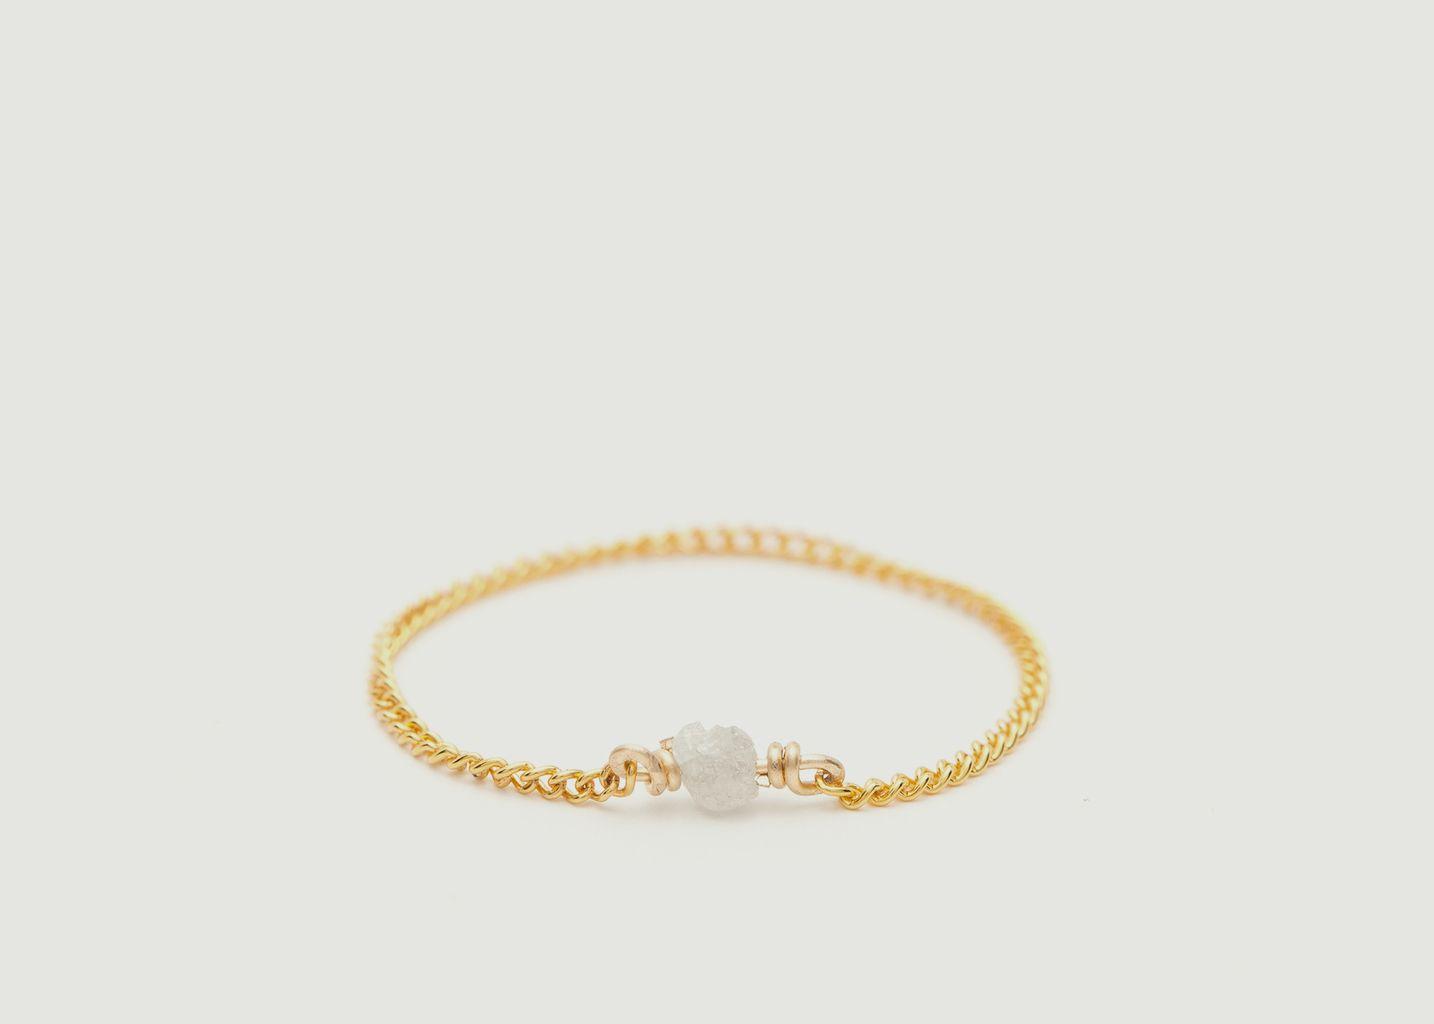 Bague chaîne gold filled Diamant Brut - YAY